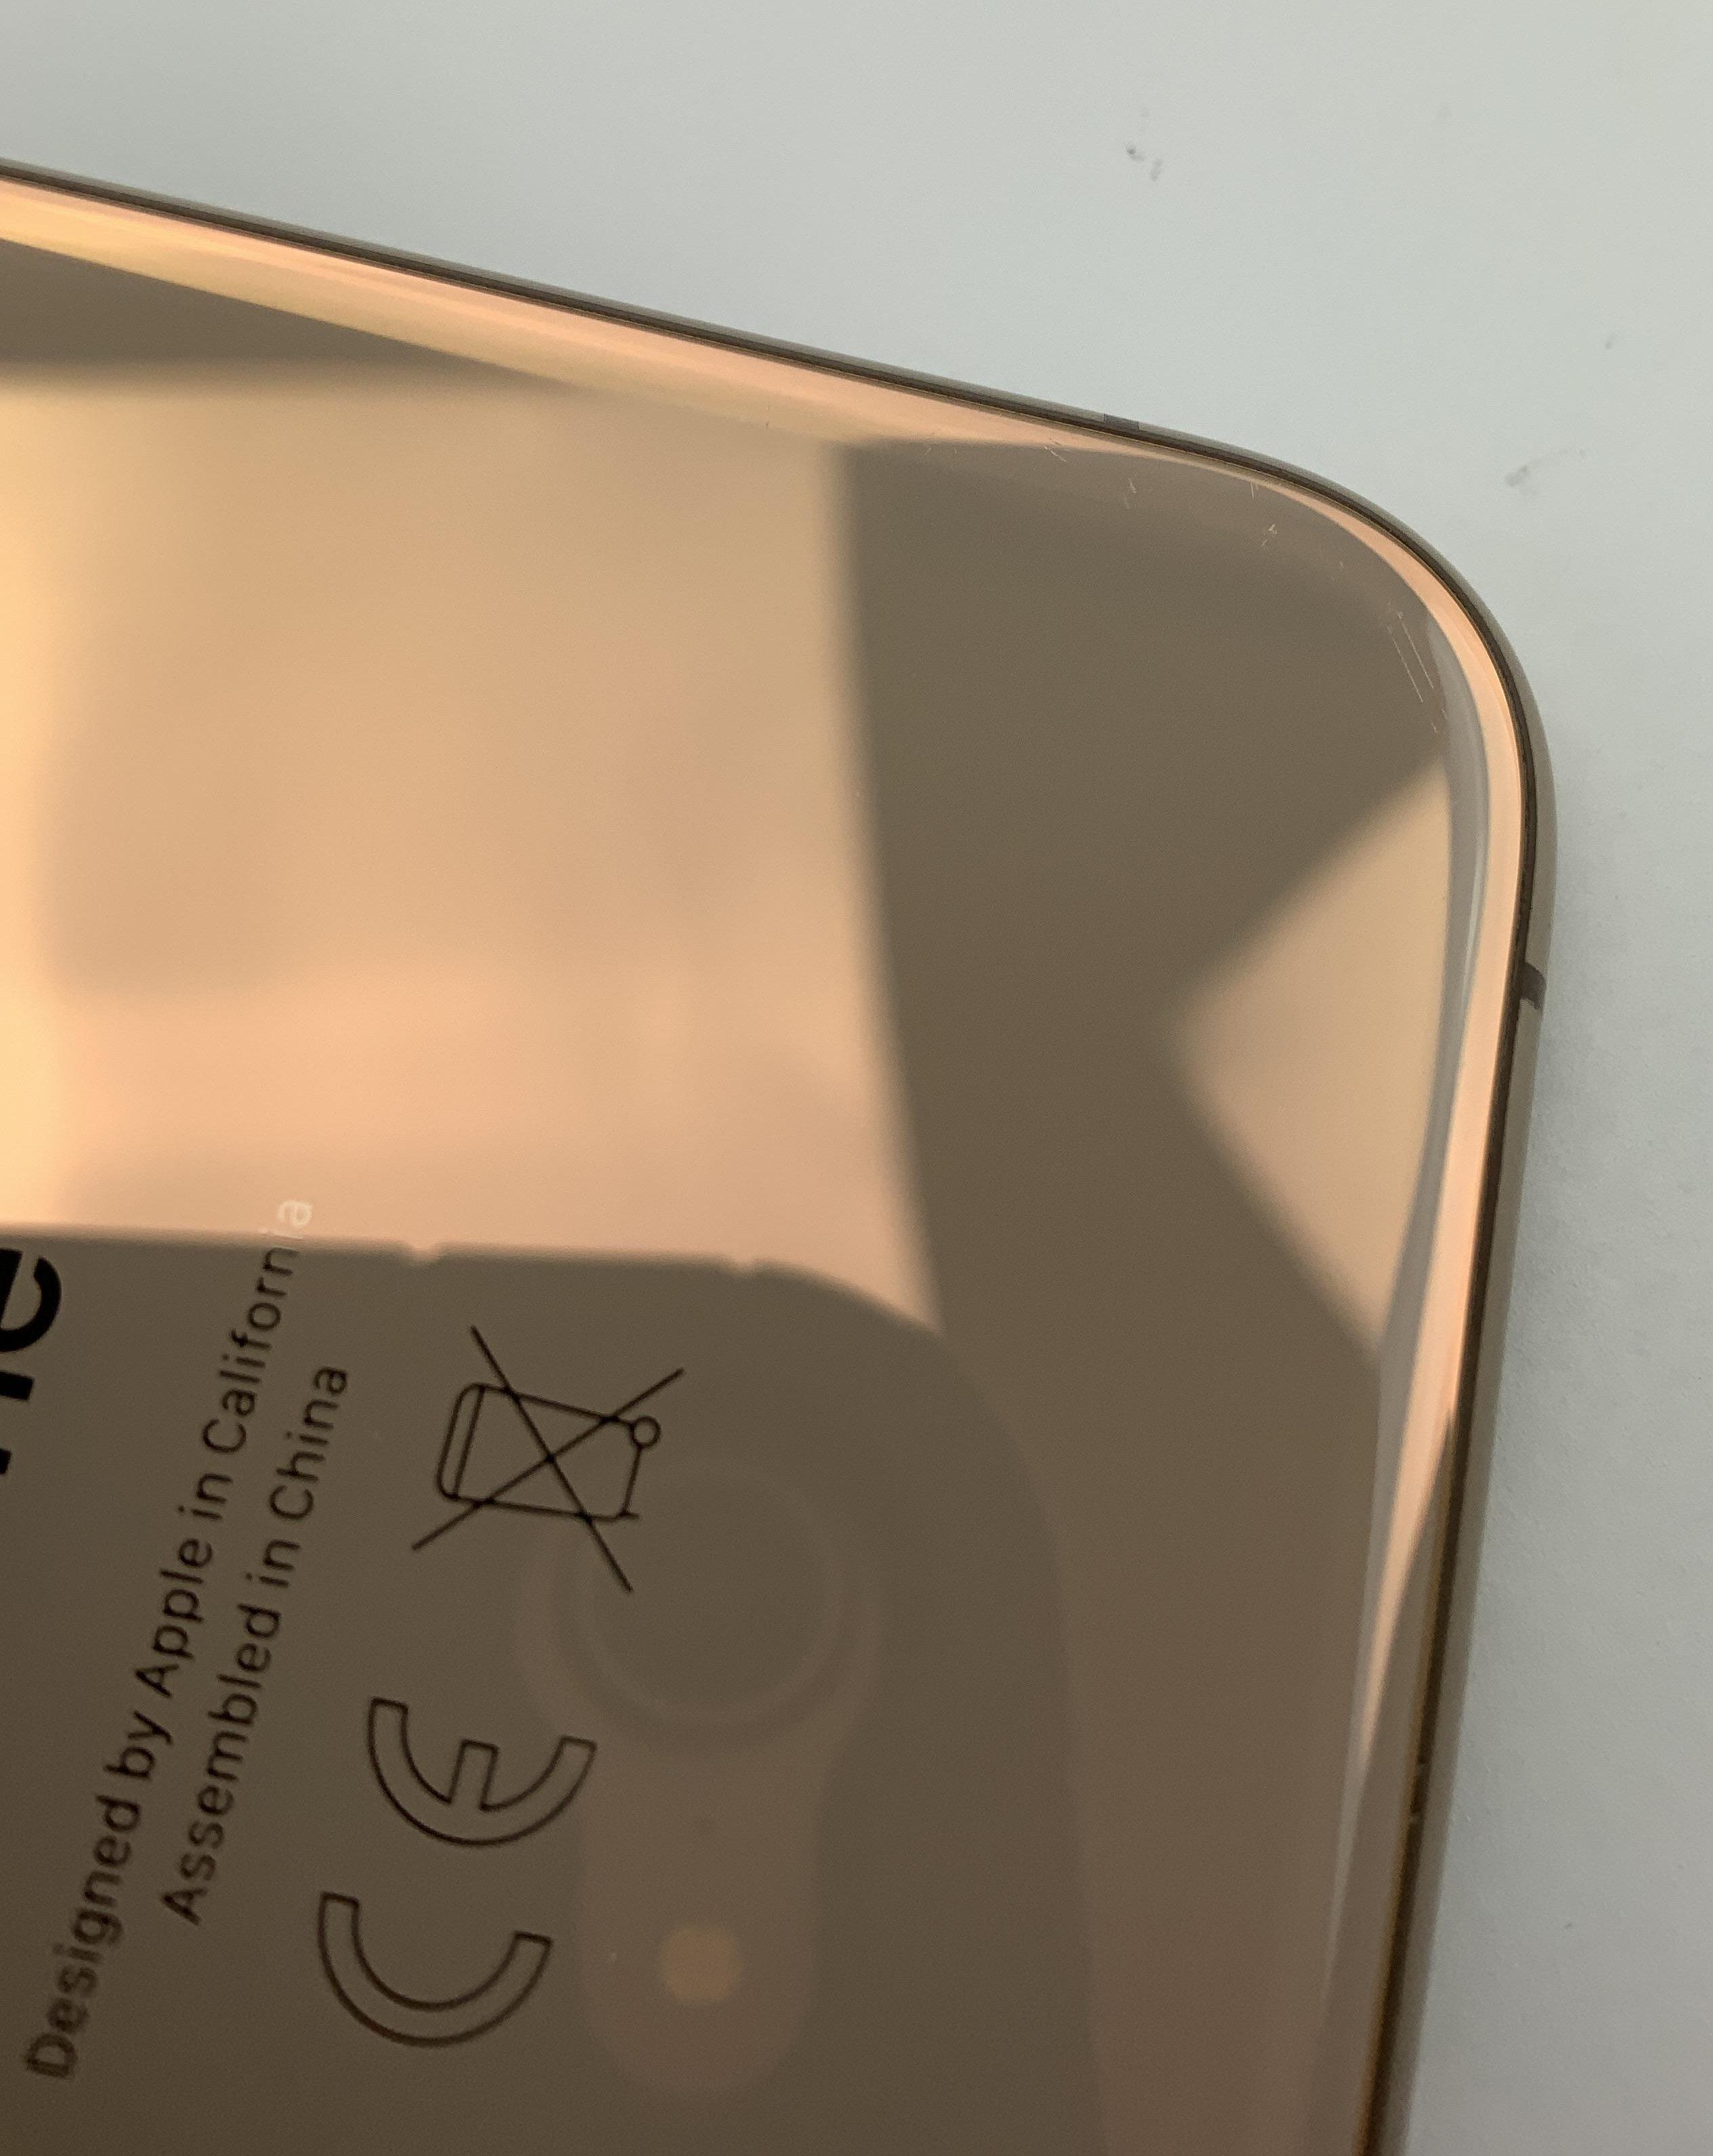 iPhone XS 64GB, 64GB, Gold, immagine 3